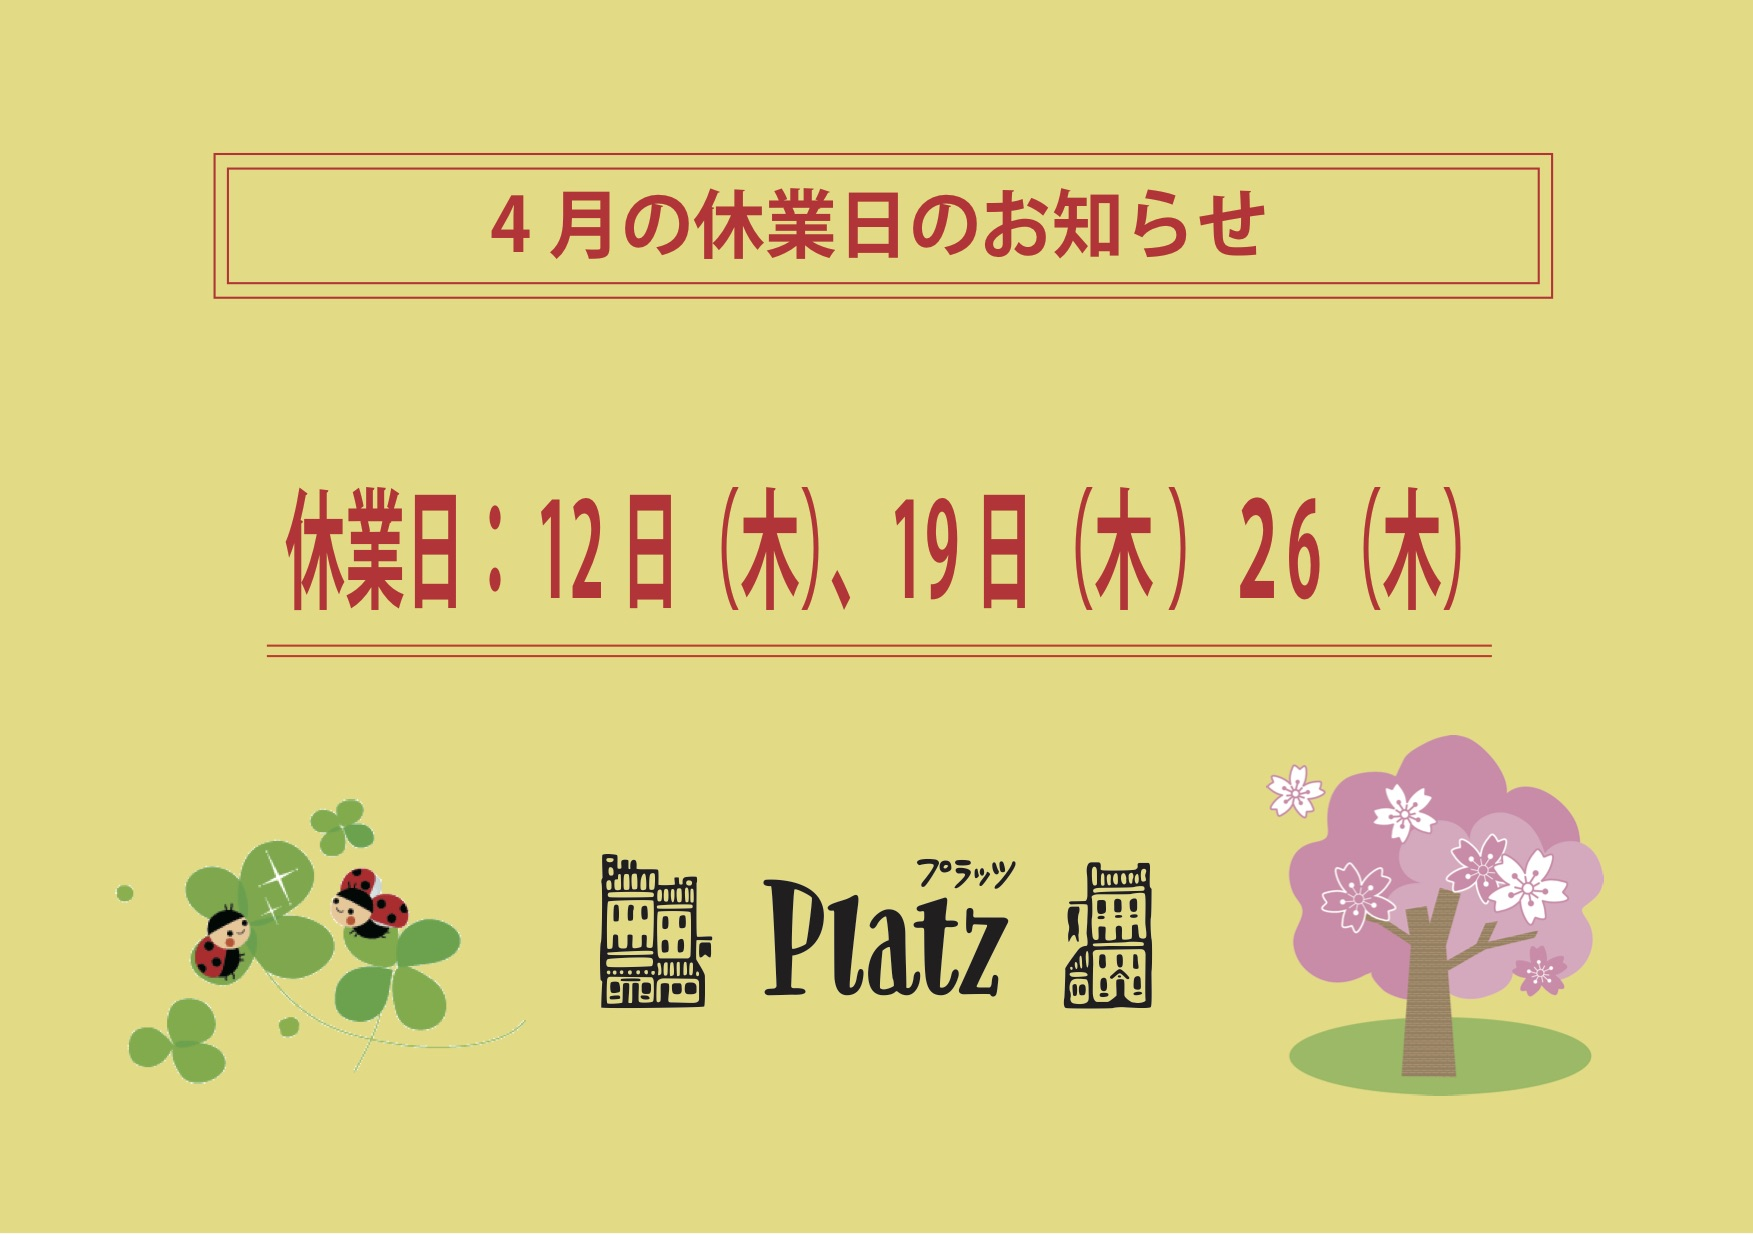 http://www.kyoto-platz.jp/news/images/2018.4%E6%9C%88%E4%BC%91%E6%A5%AD%E6%97%A5%E3%81%AE%E3%82%B3%E3%83%94%E3%83%BC.jpg